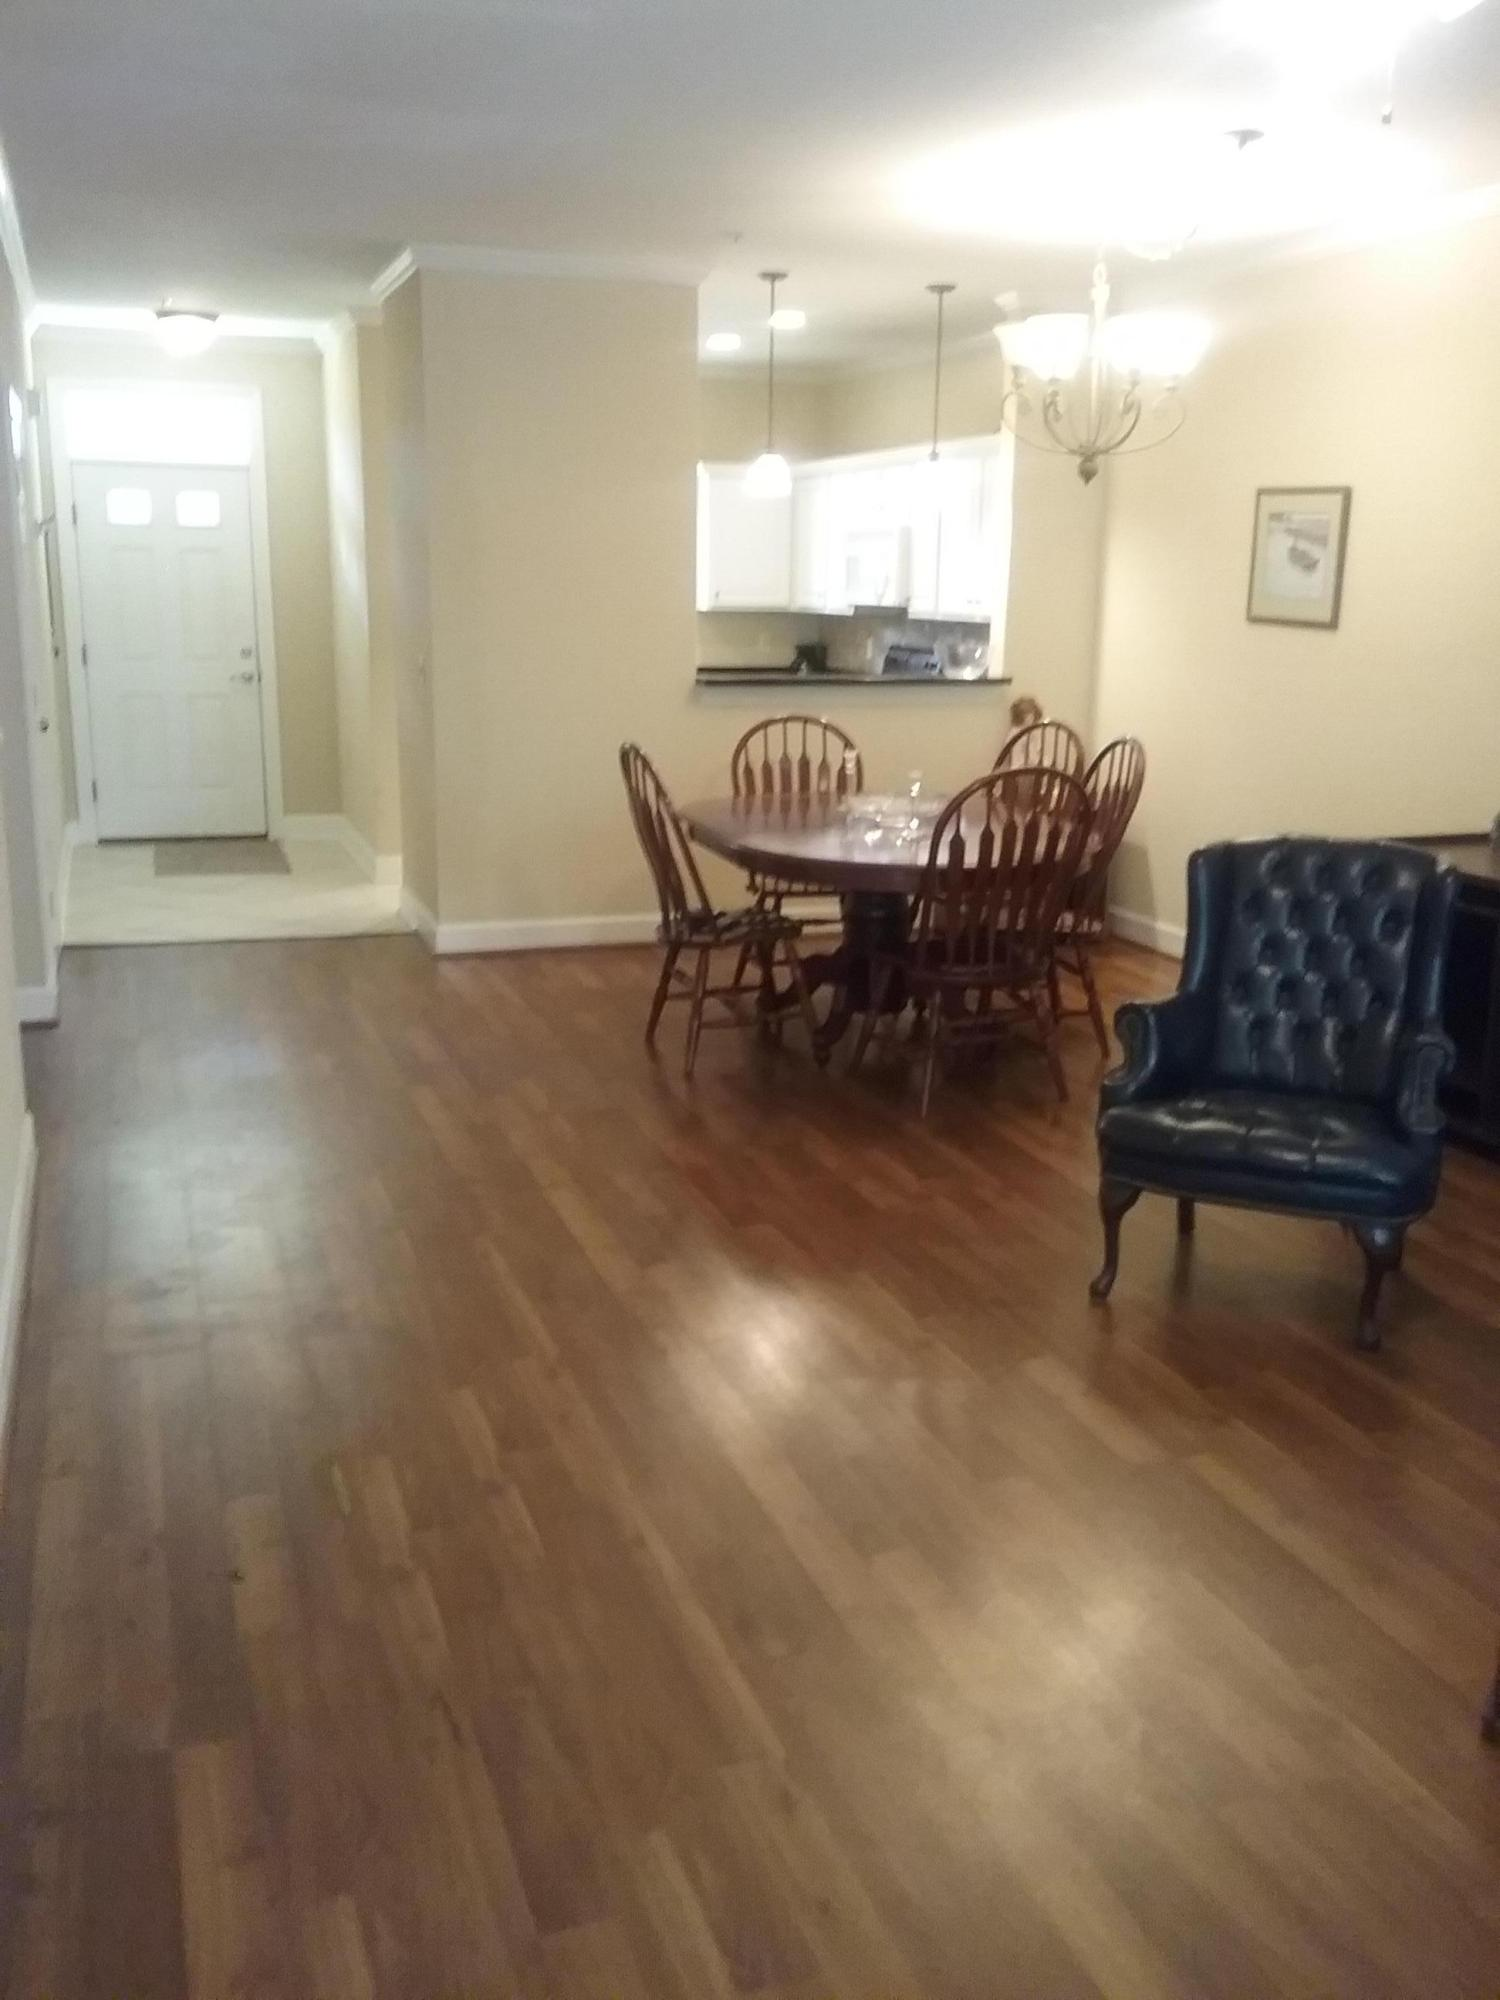 Ballards Pointe II Homes For Sale - 103 Ballard, Santee, SC - 19